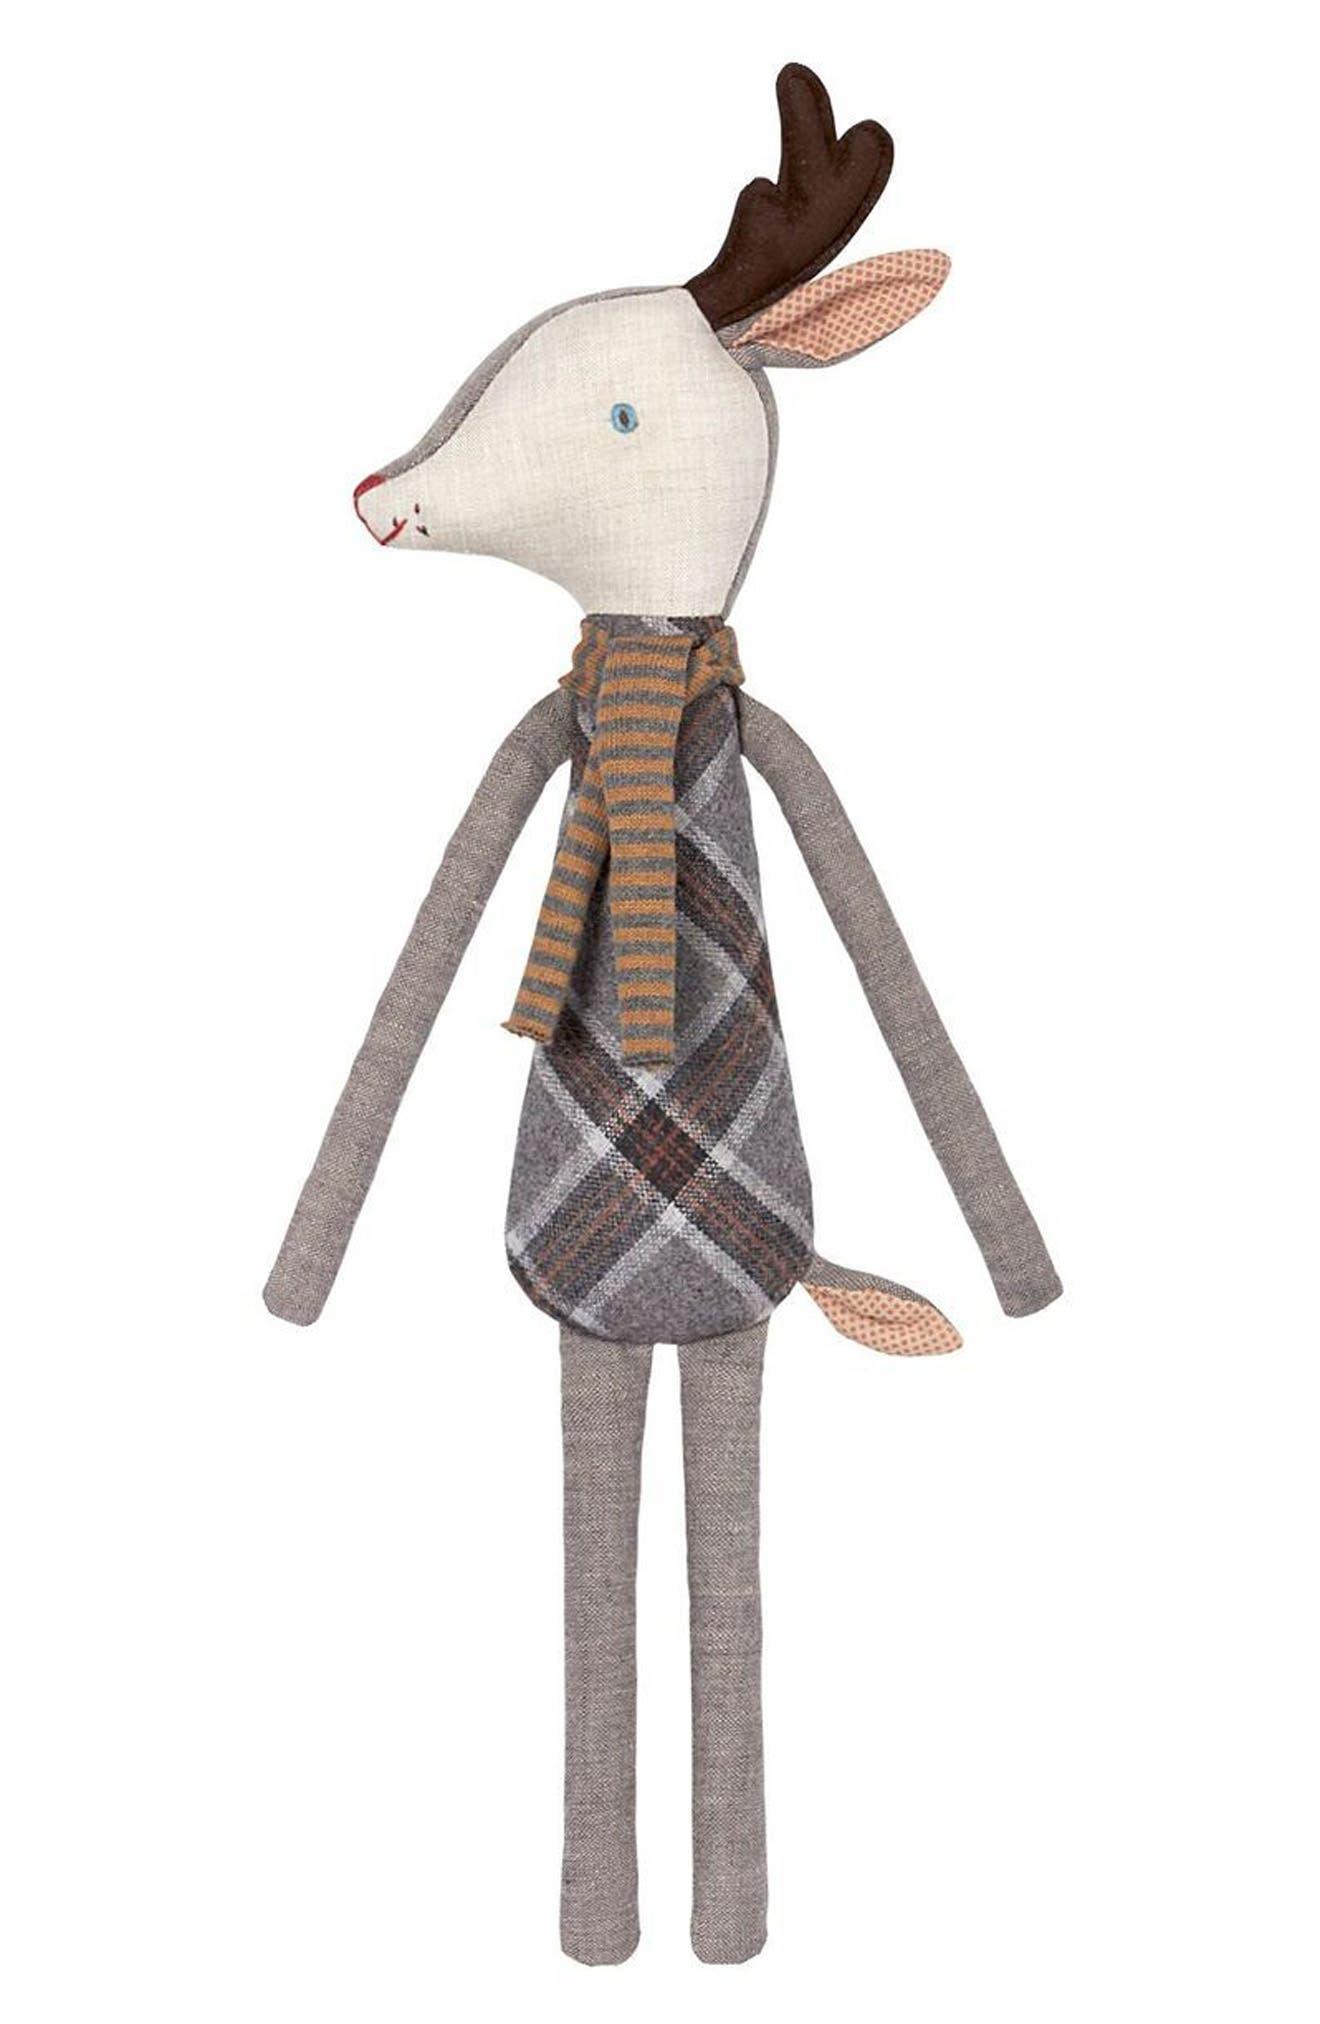 Sleepy-Wakey Reindeer Stuffed Animal,                             Main thumbnail 2, color,